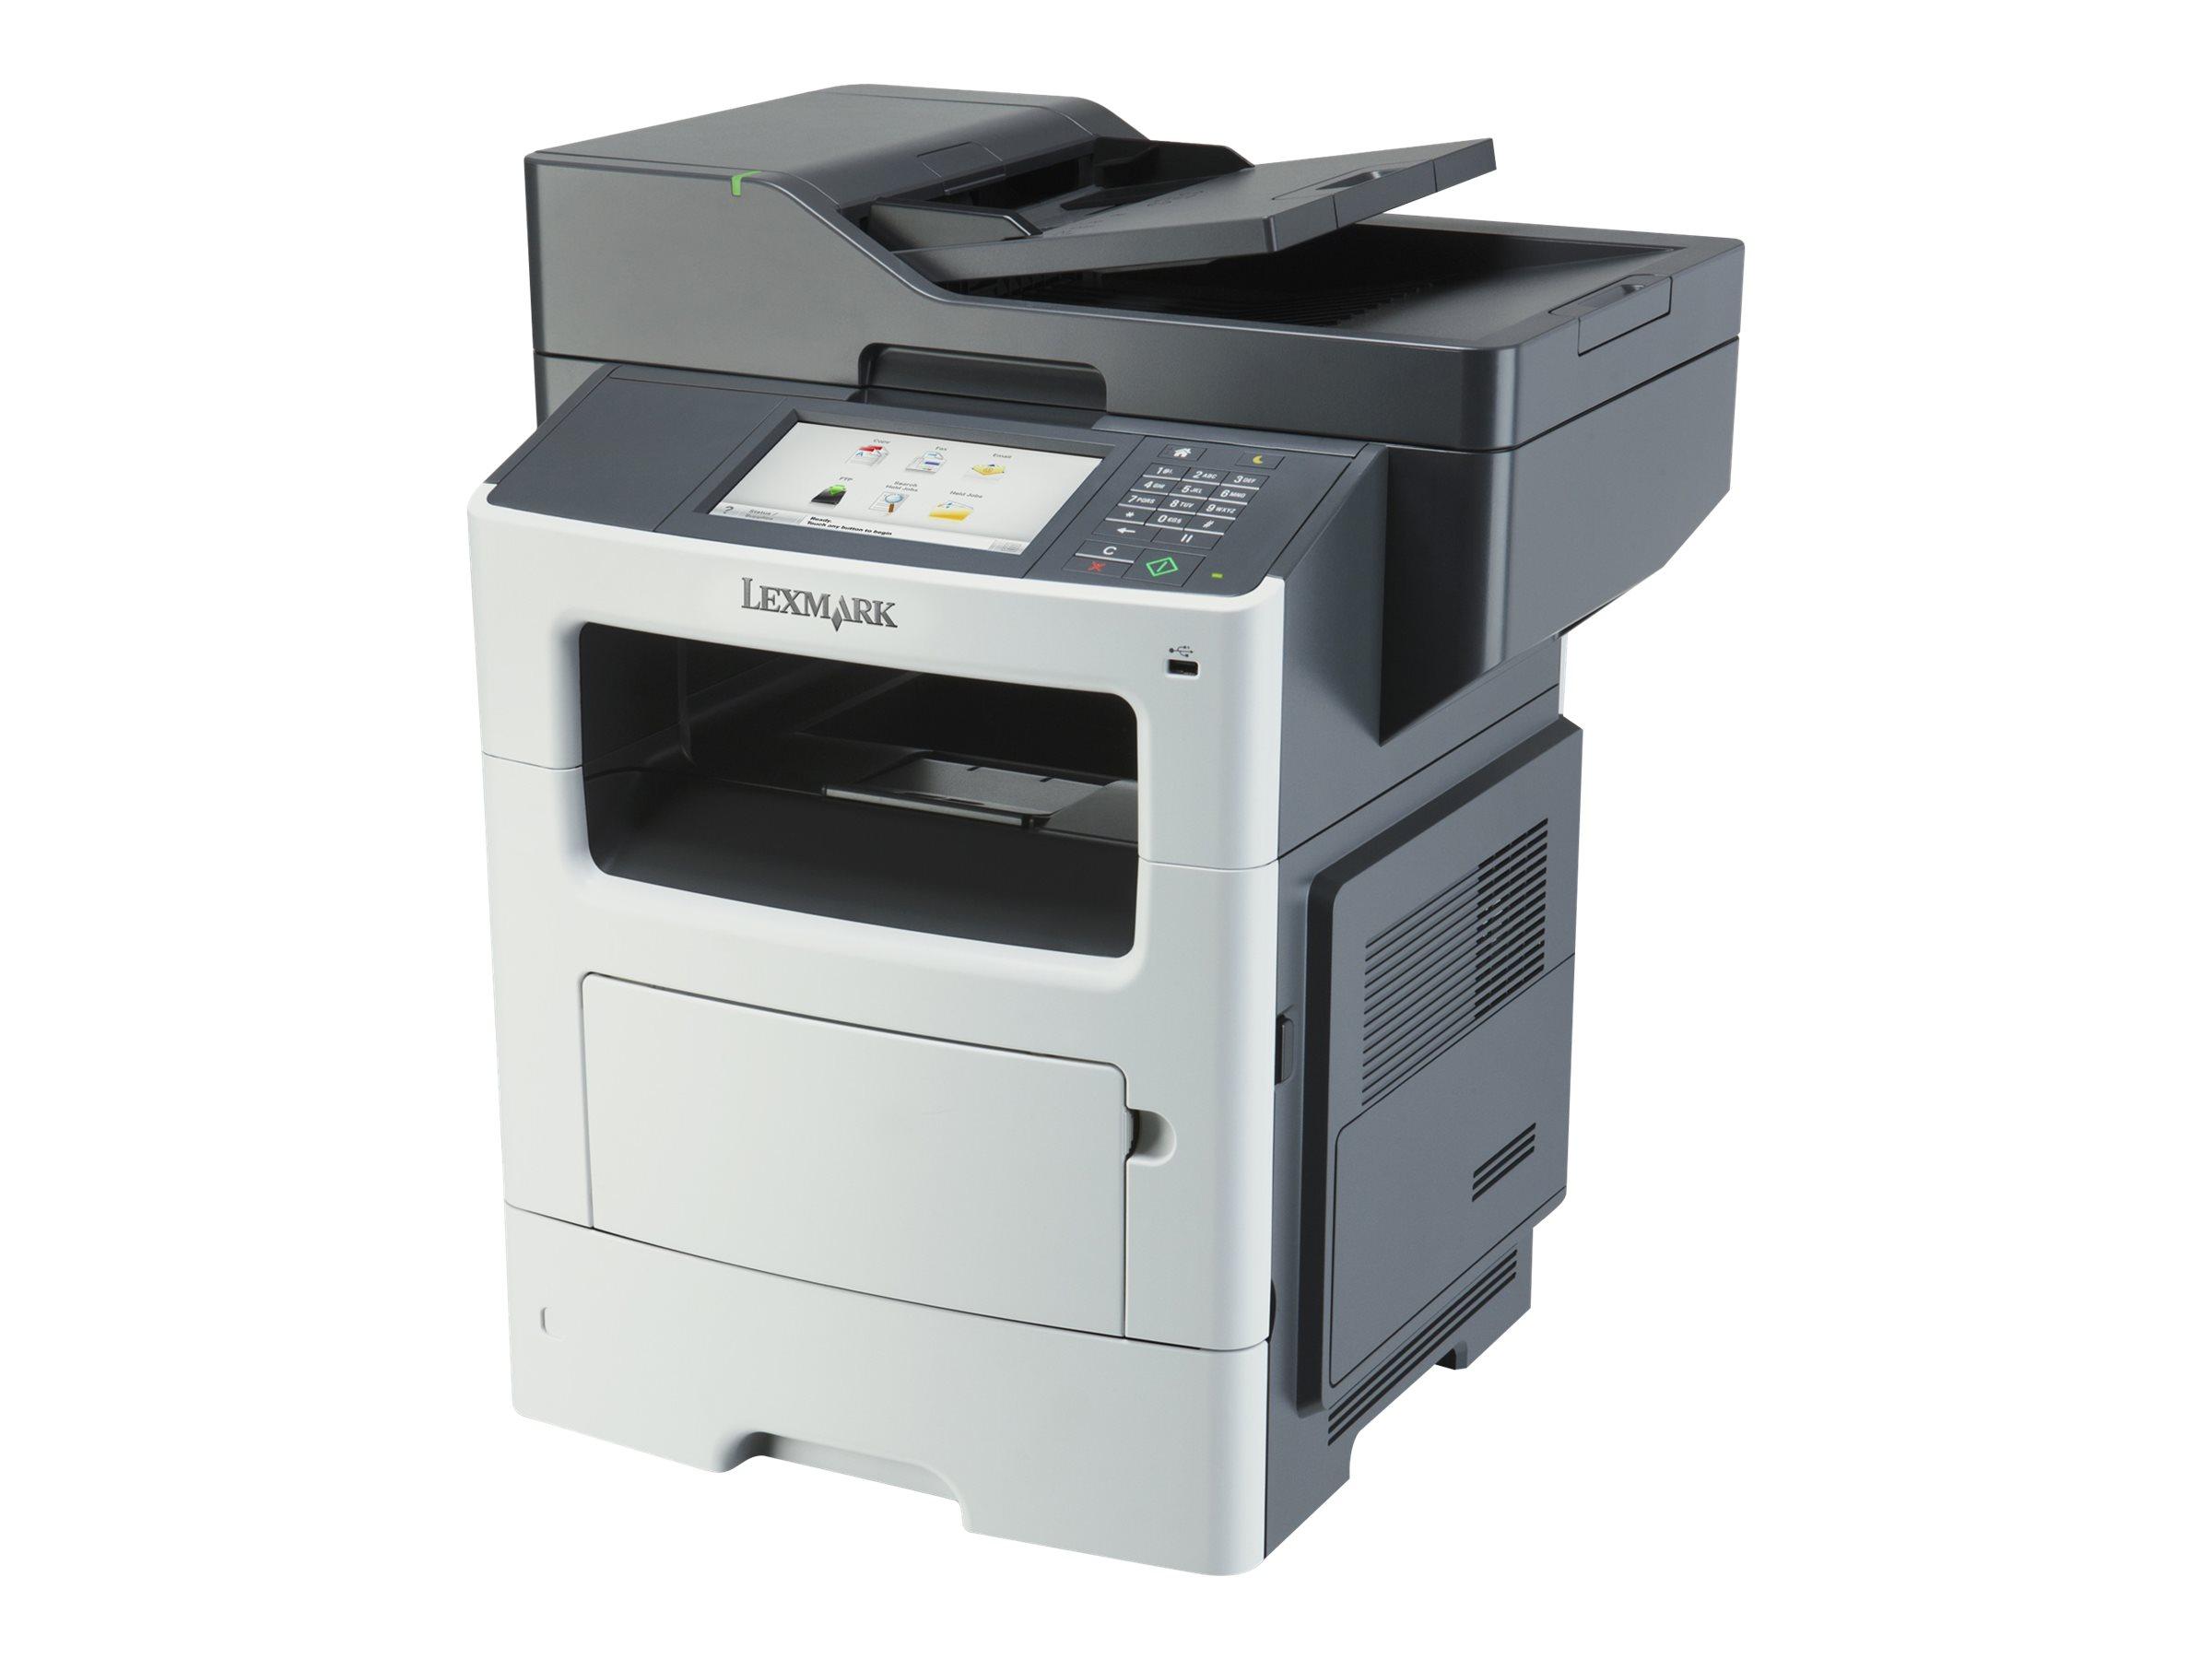 Lexmark MX617de - Multifunktionsdrucker